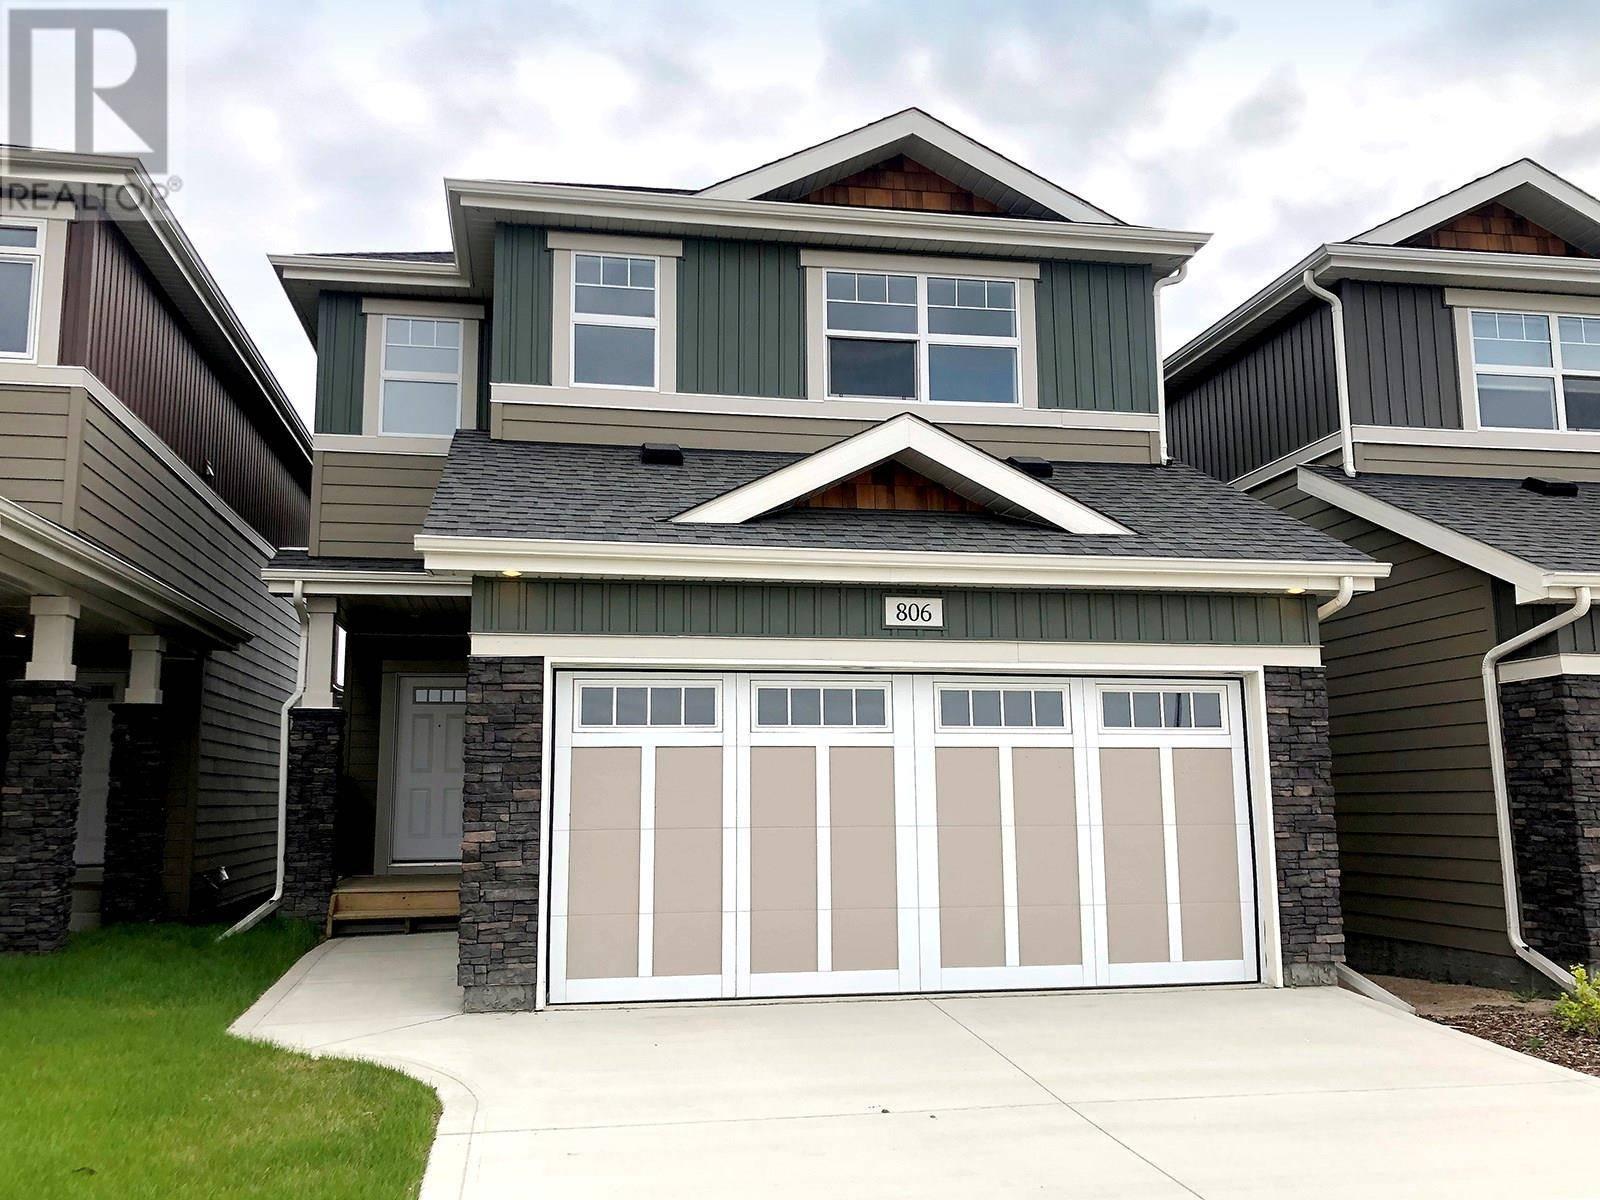 House for sale at 806 Kensington Blvd Saskatoon Saskatchewan - MLS: SK782959